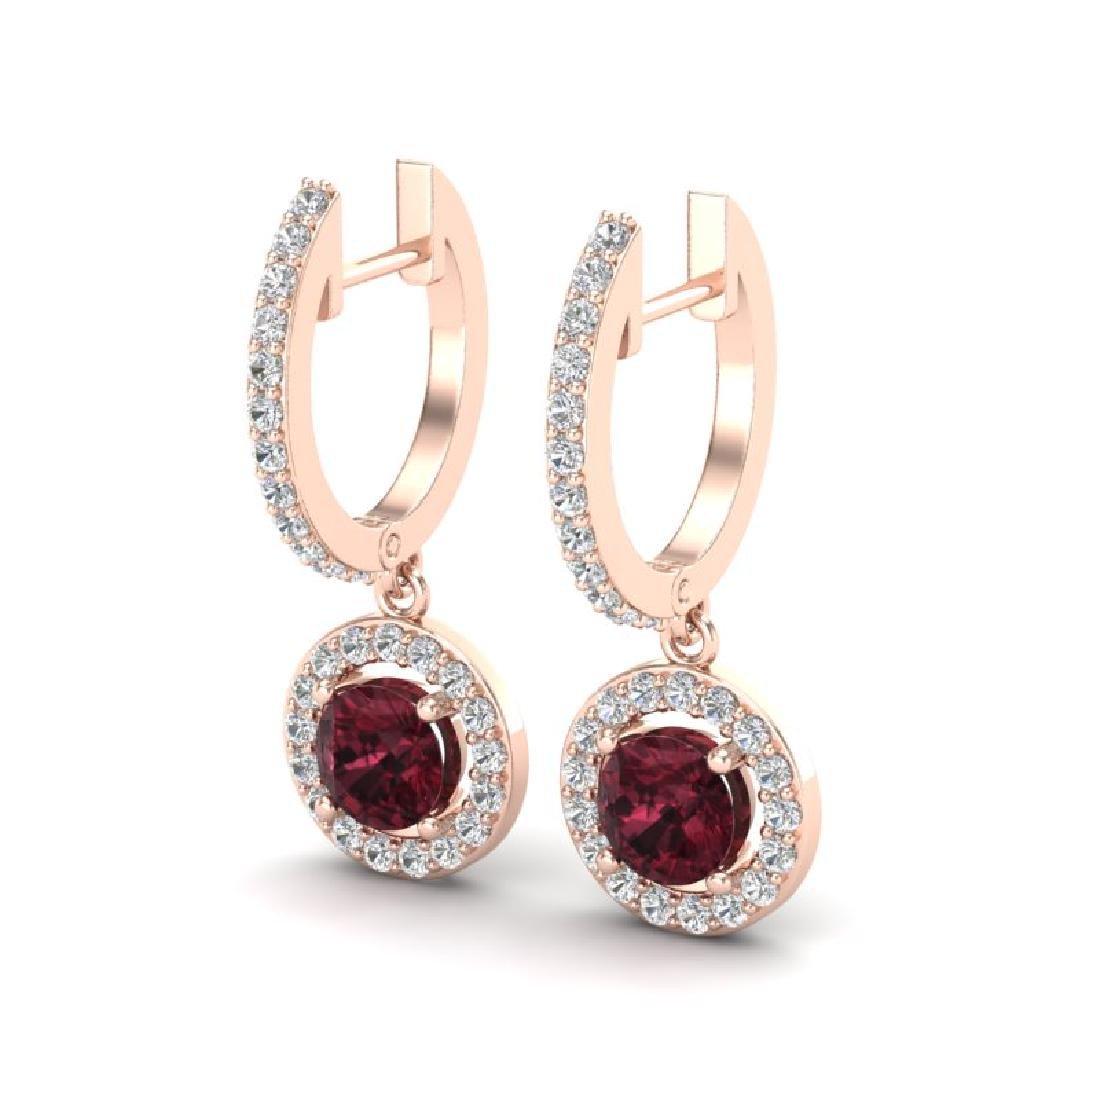 1.75 CTW Garnet & Micro Halo VS/SI Diamond Earrings 14K